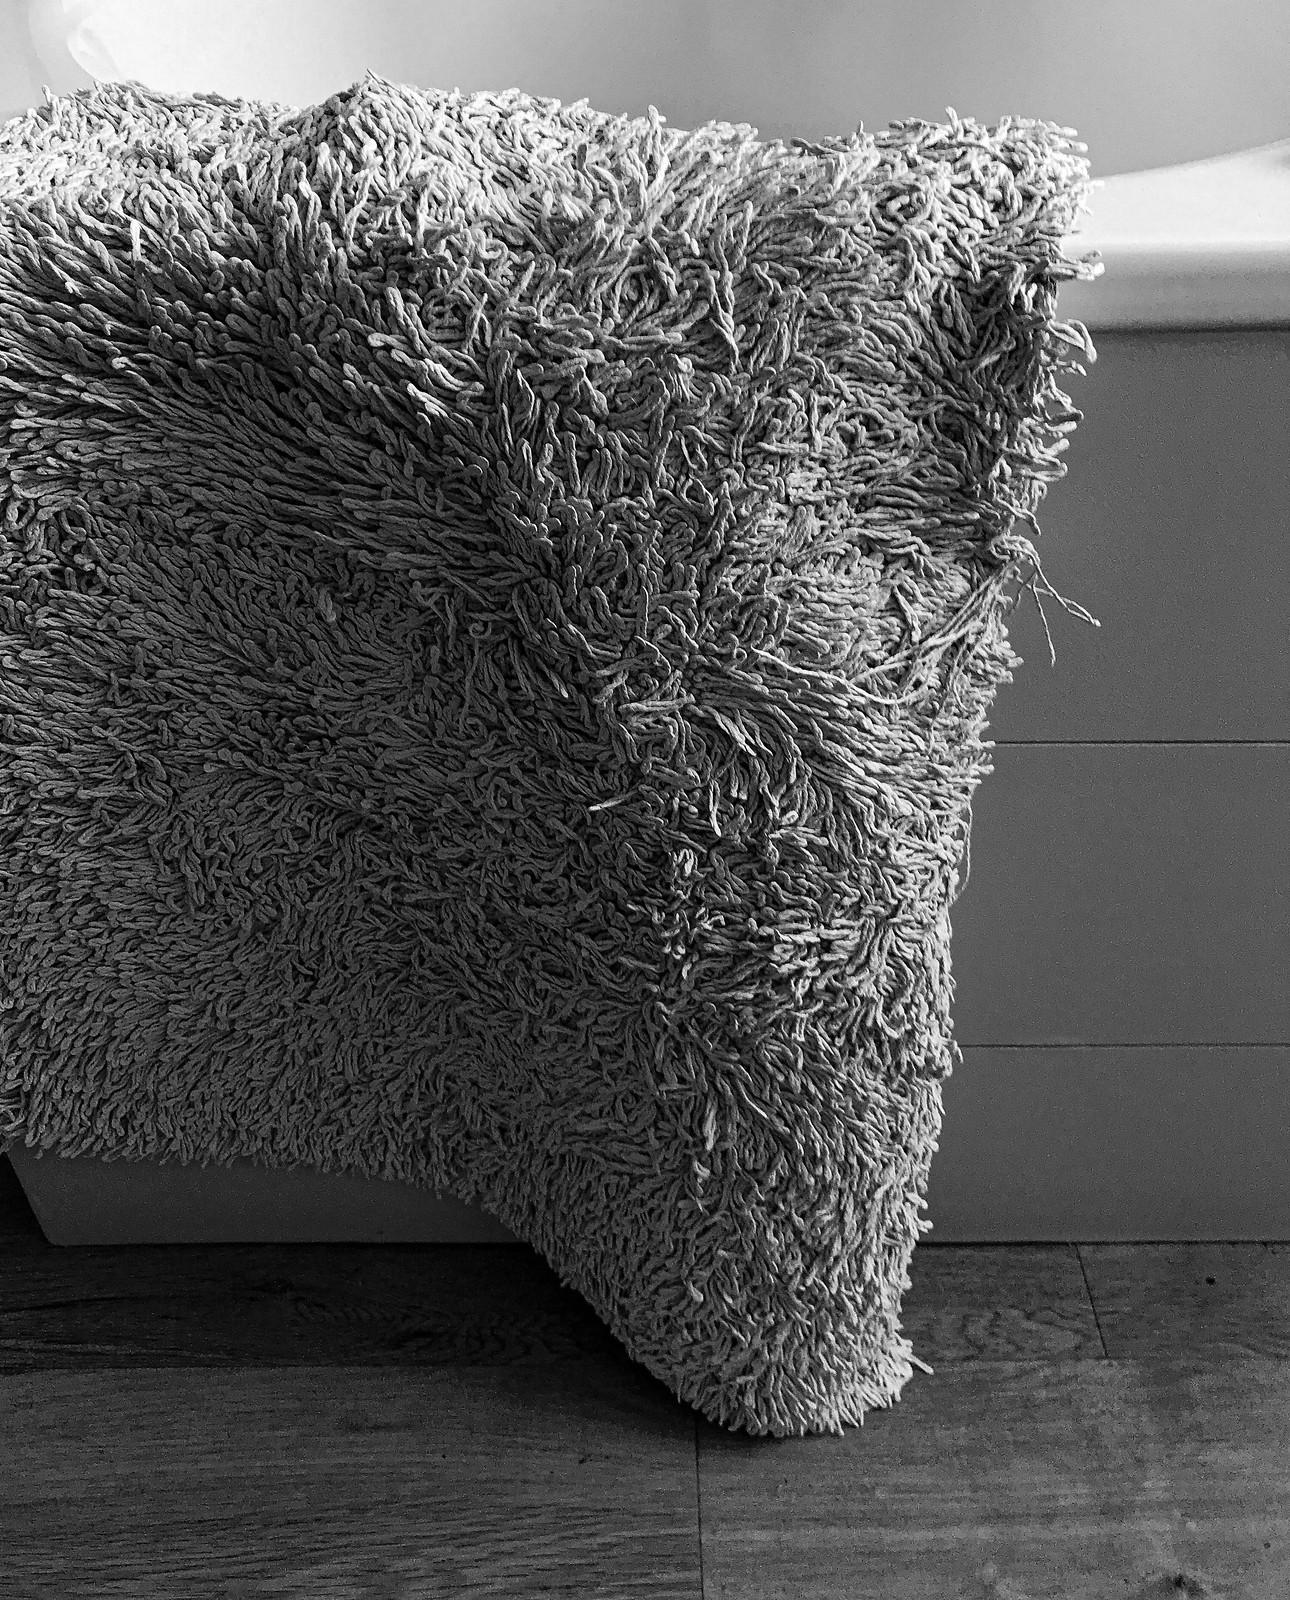 The bath mat at rest